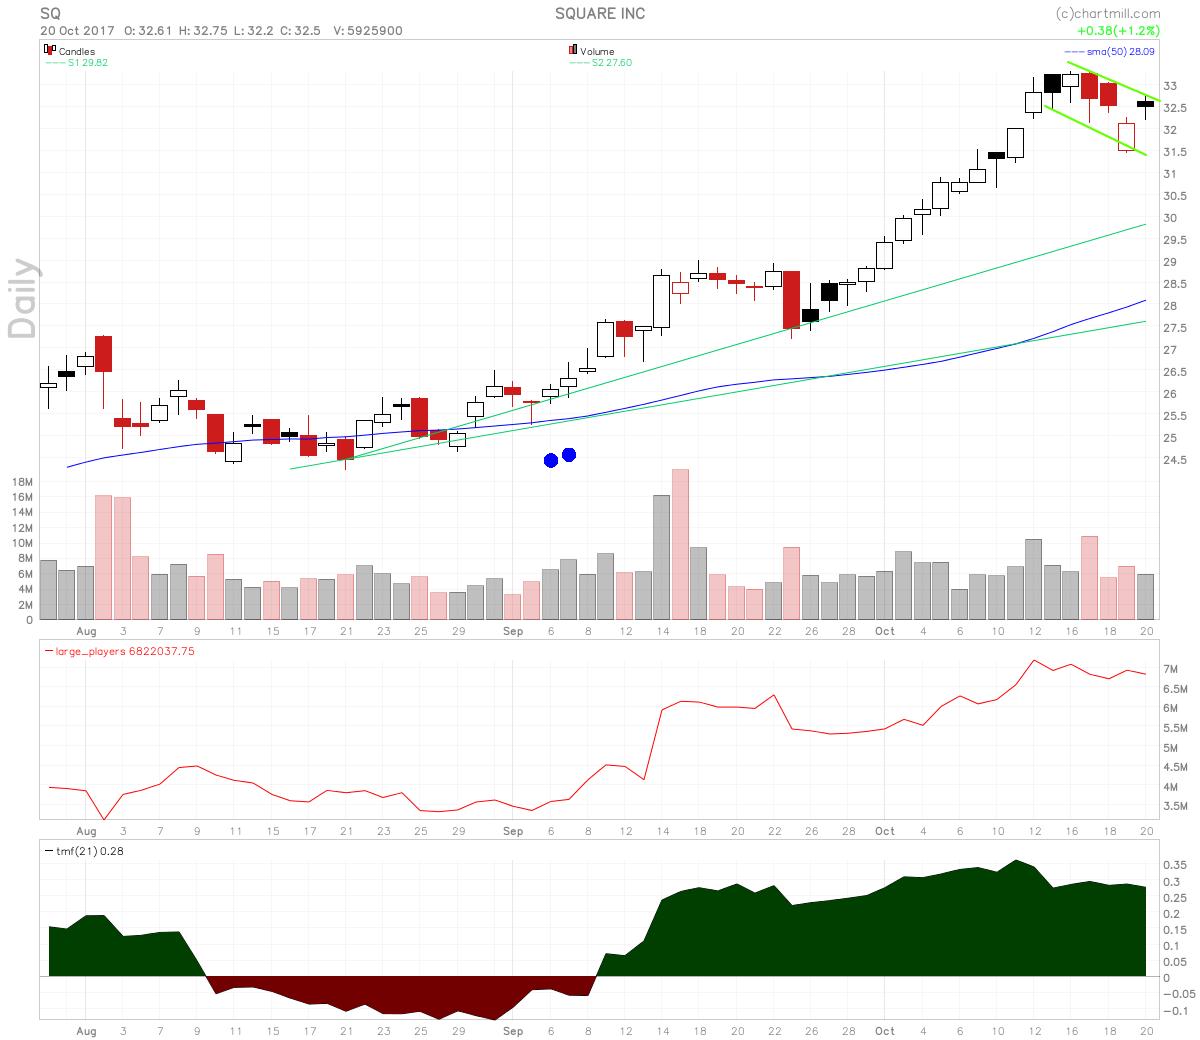 Square Inc Stock In Bullish Flag On Citigroup Price Hike